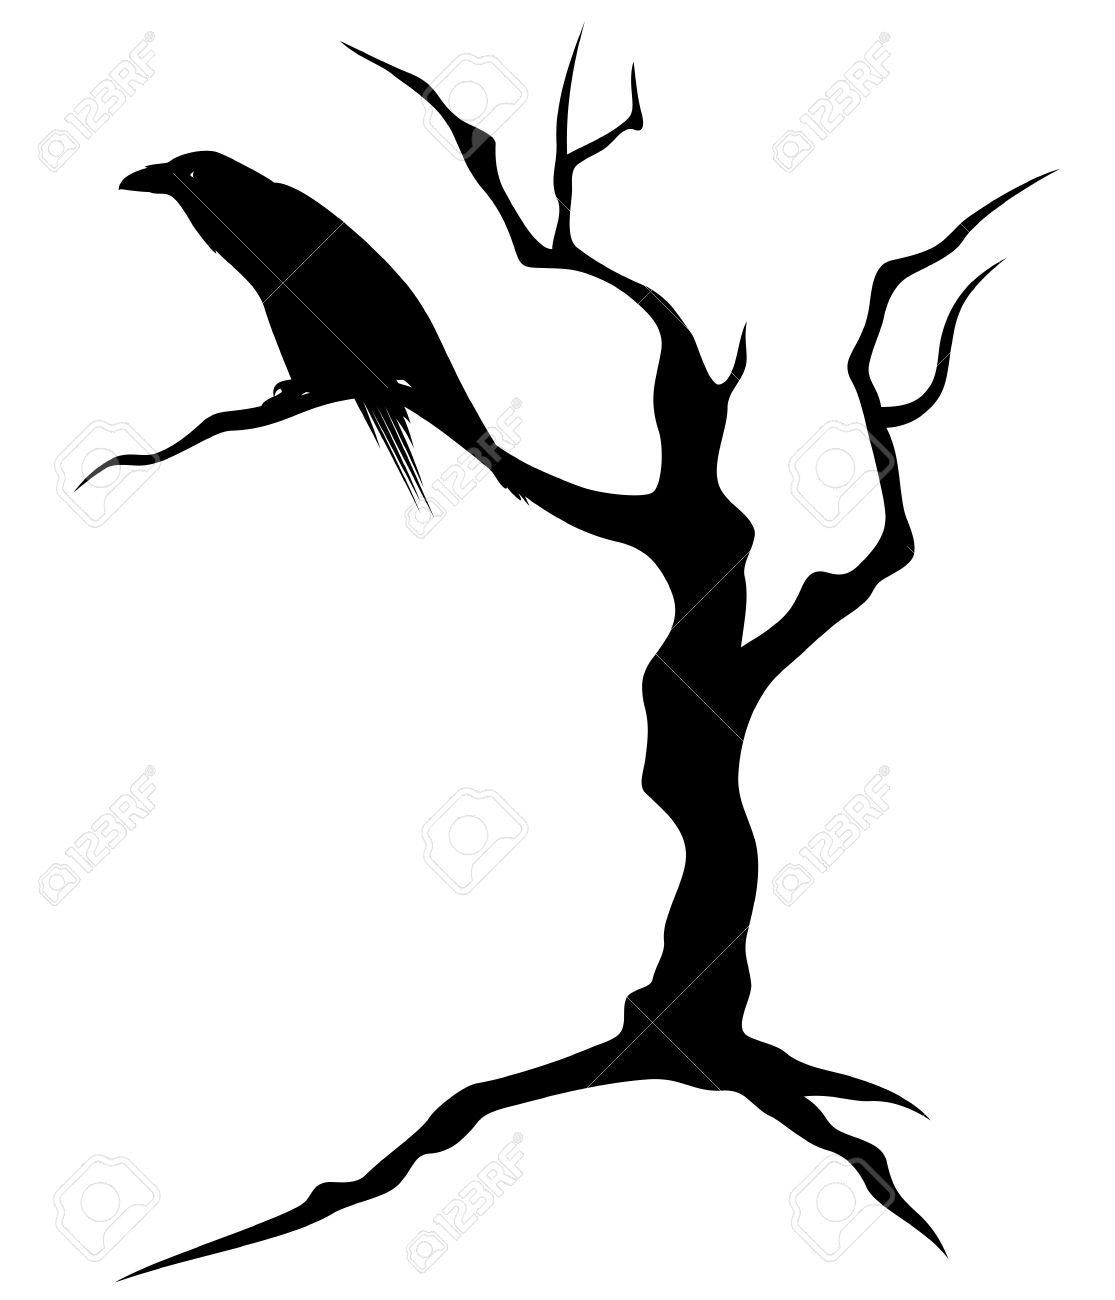 1115x1300 Raven Clipart Branch Silhouette